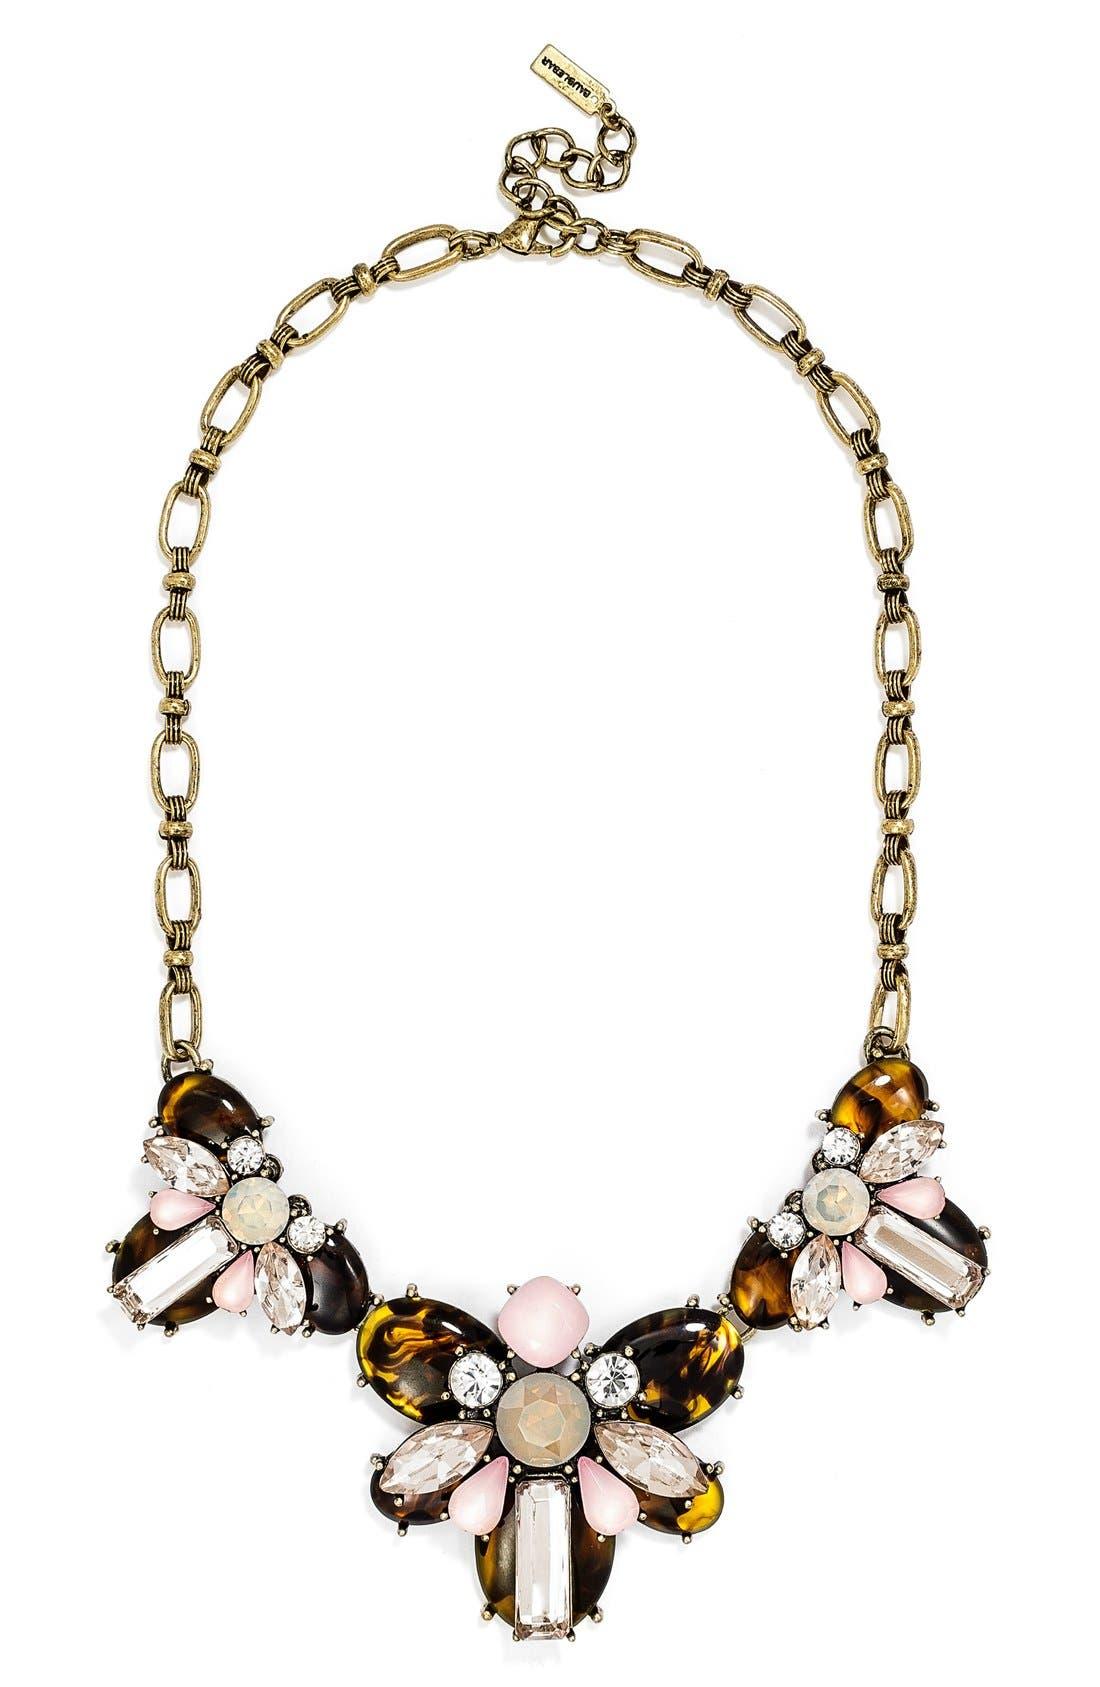 Alternate Image 1 Selected - BaubleBar 'Bliss' Bib Necklace